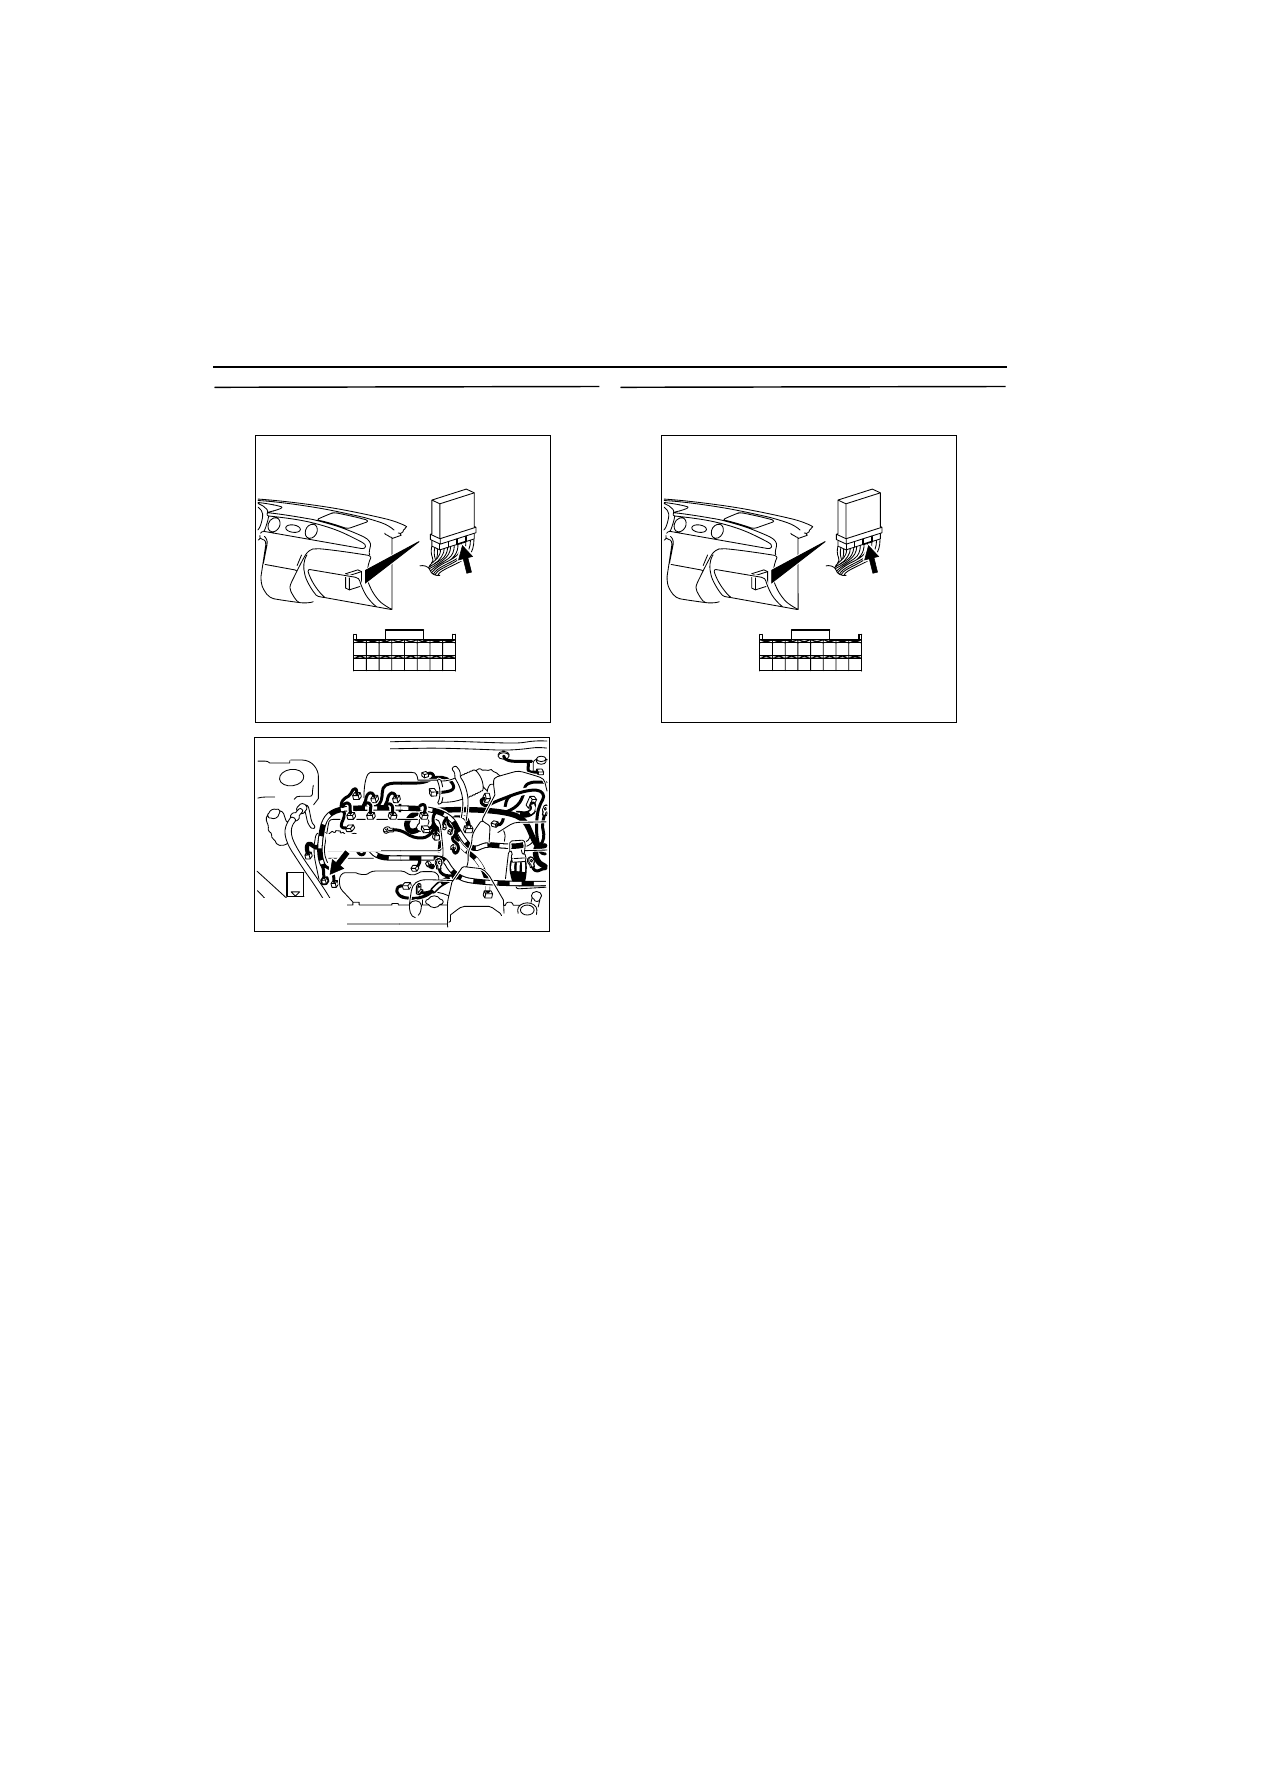 mitsubishi outlander 2003 manual part 75 rh zinref ru